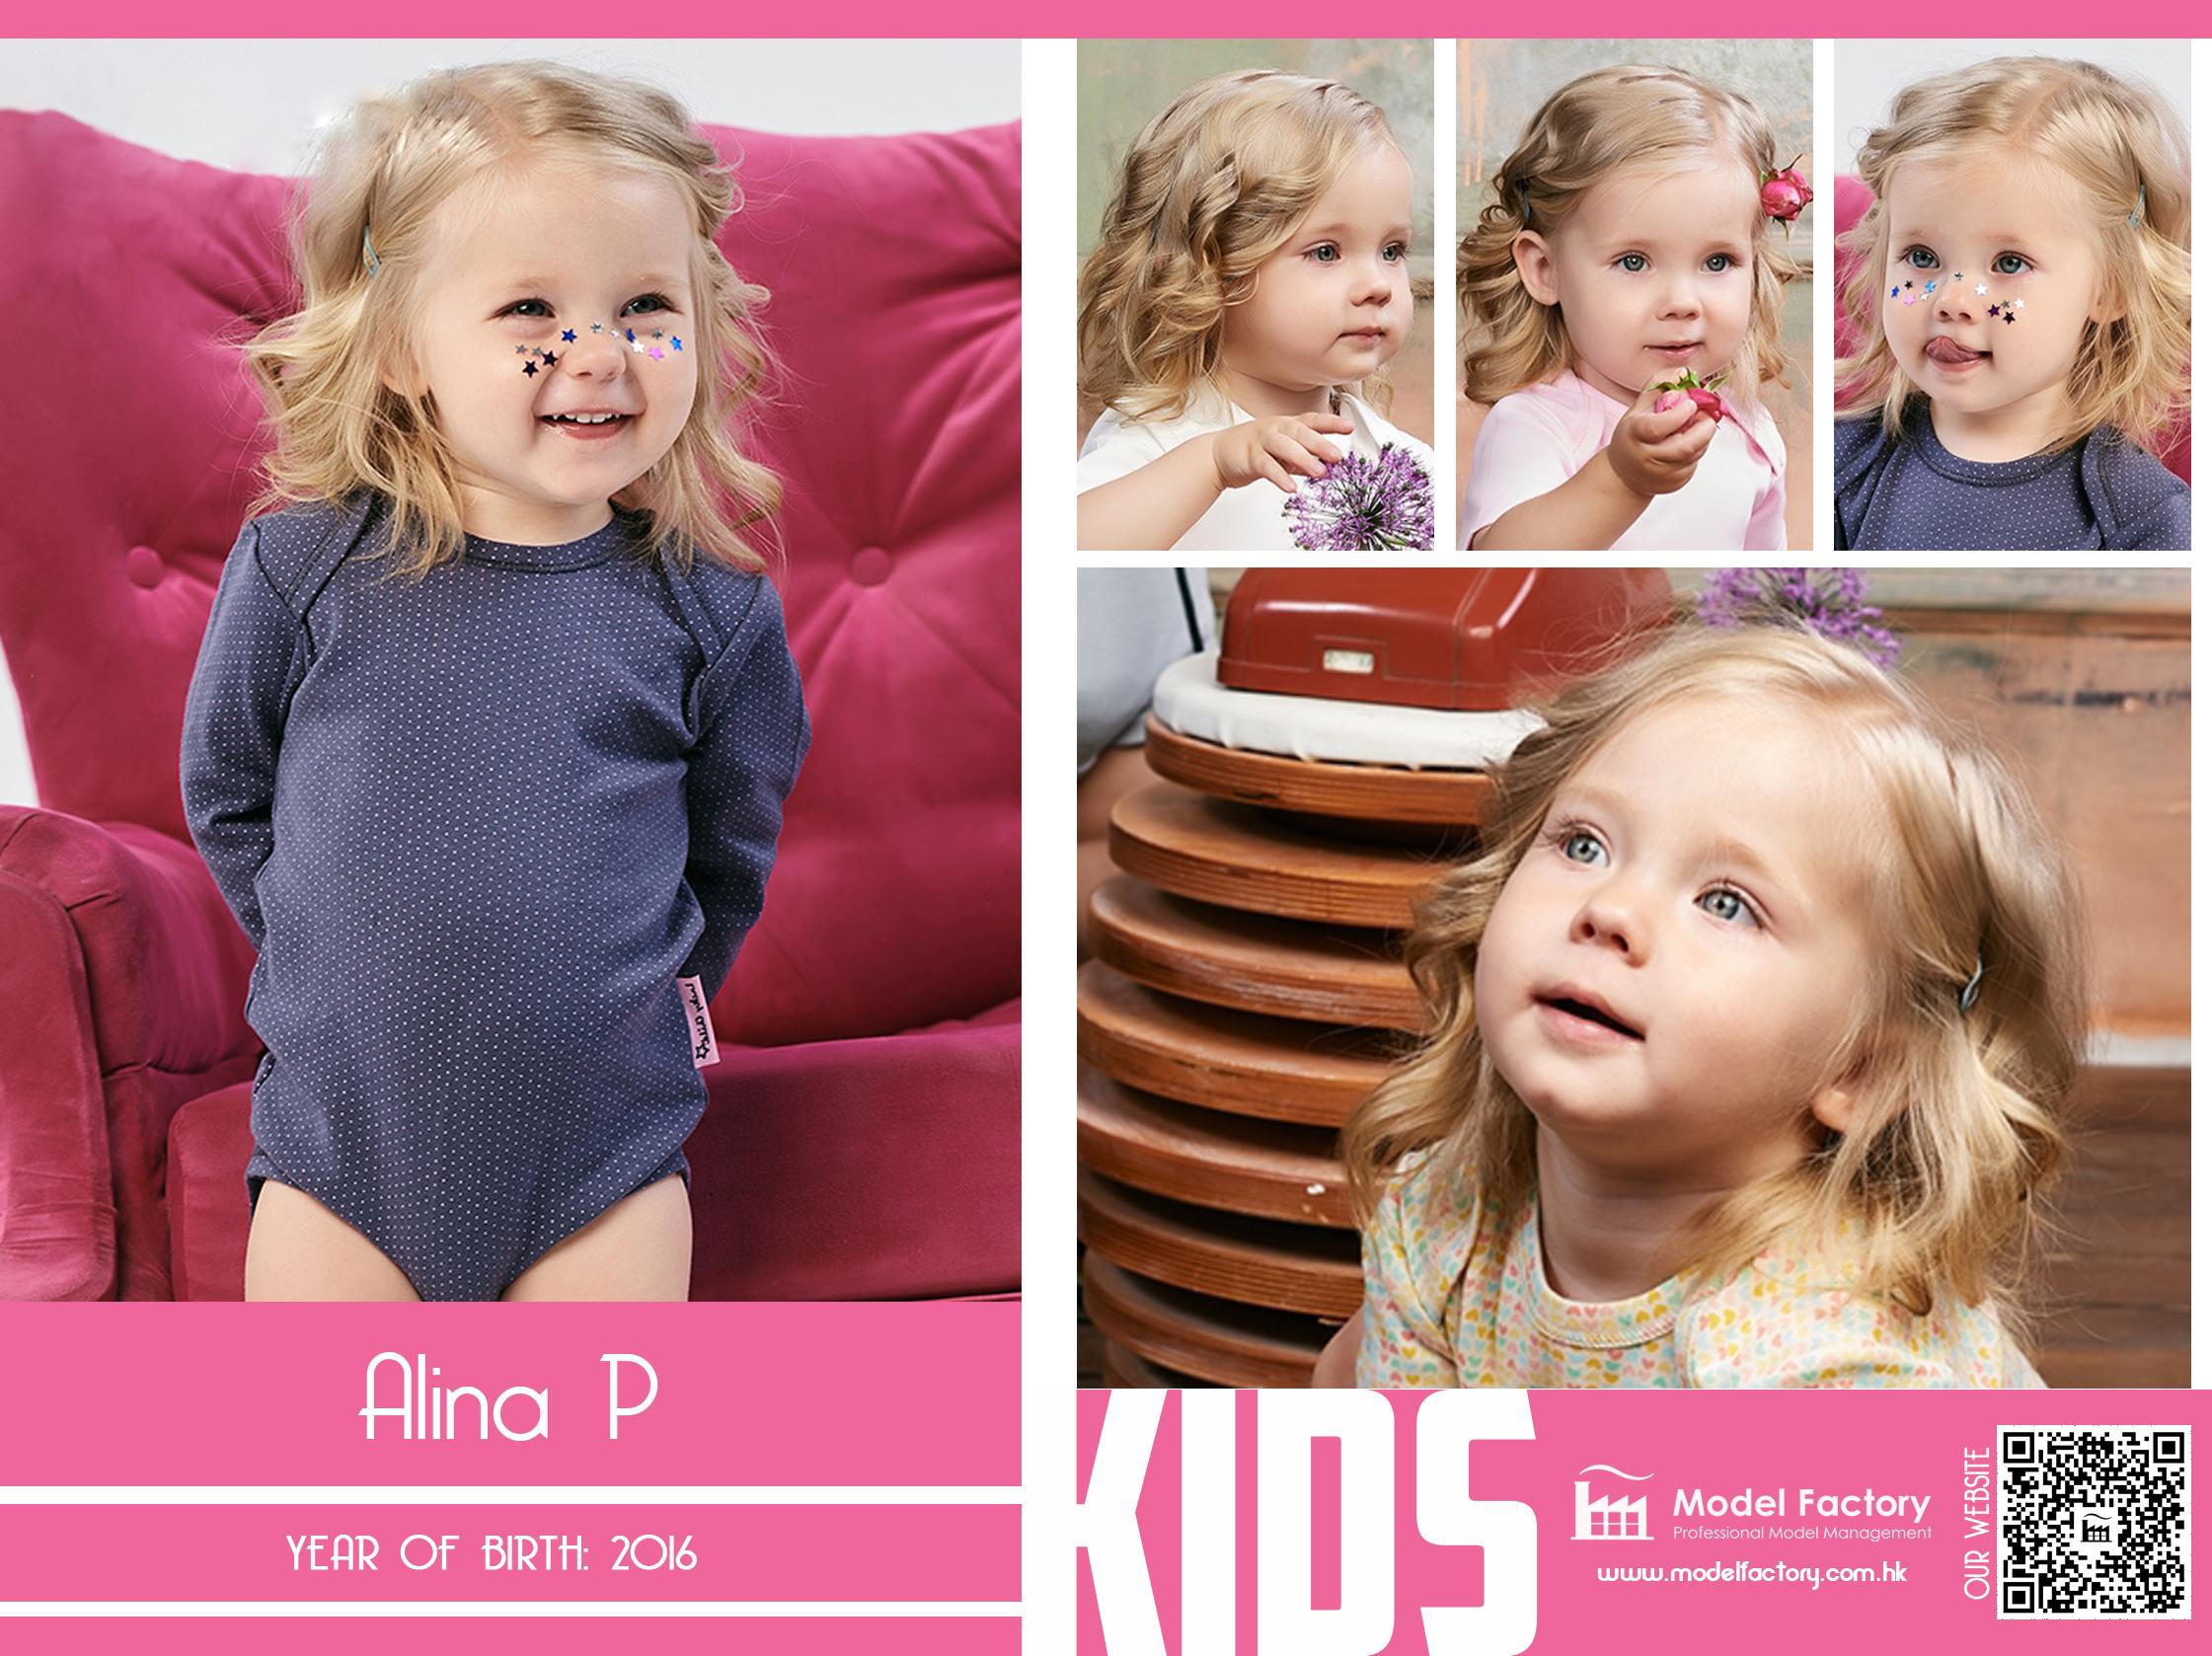 Model Factory Caucasian Kids Alina P